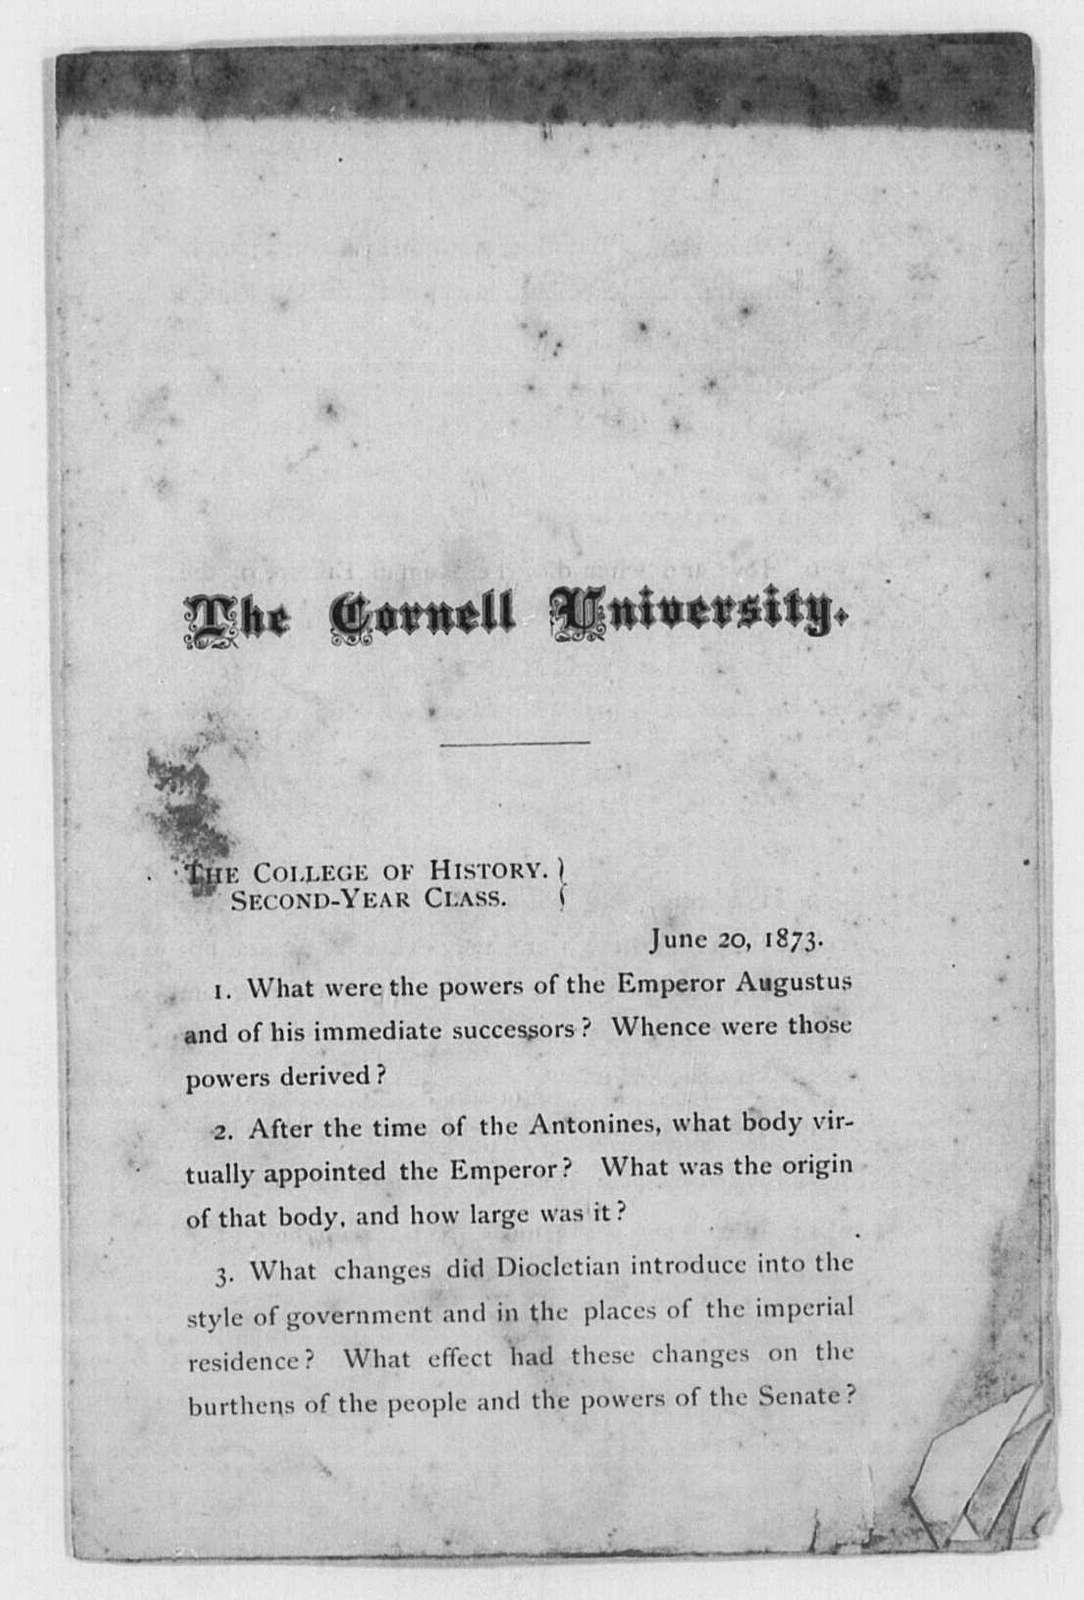 Cornell University, Ithaca, N.Y., History Examinations, 1872-1873